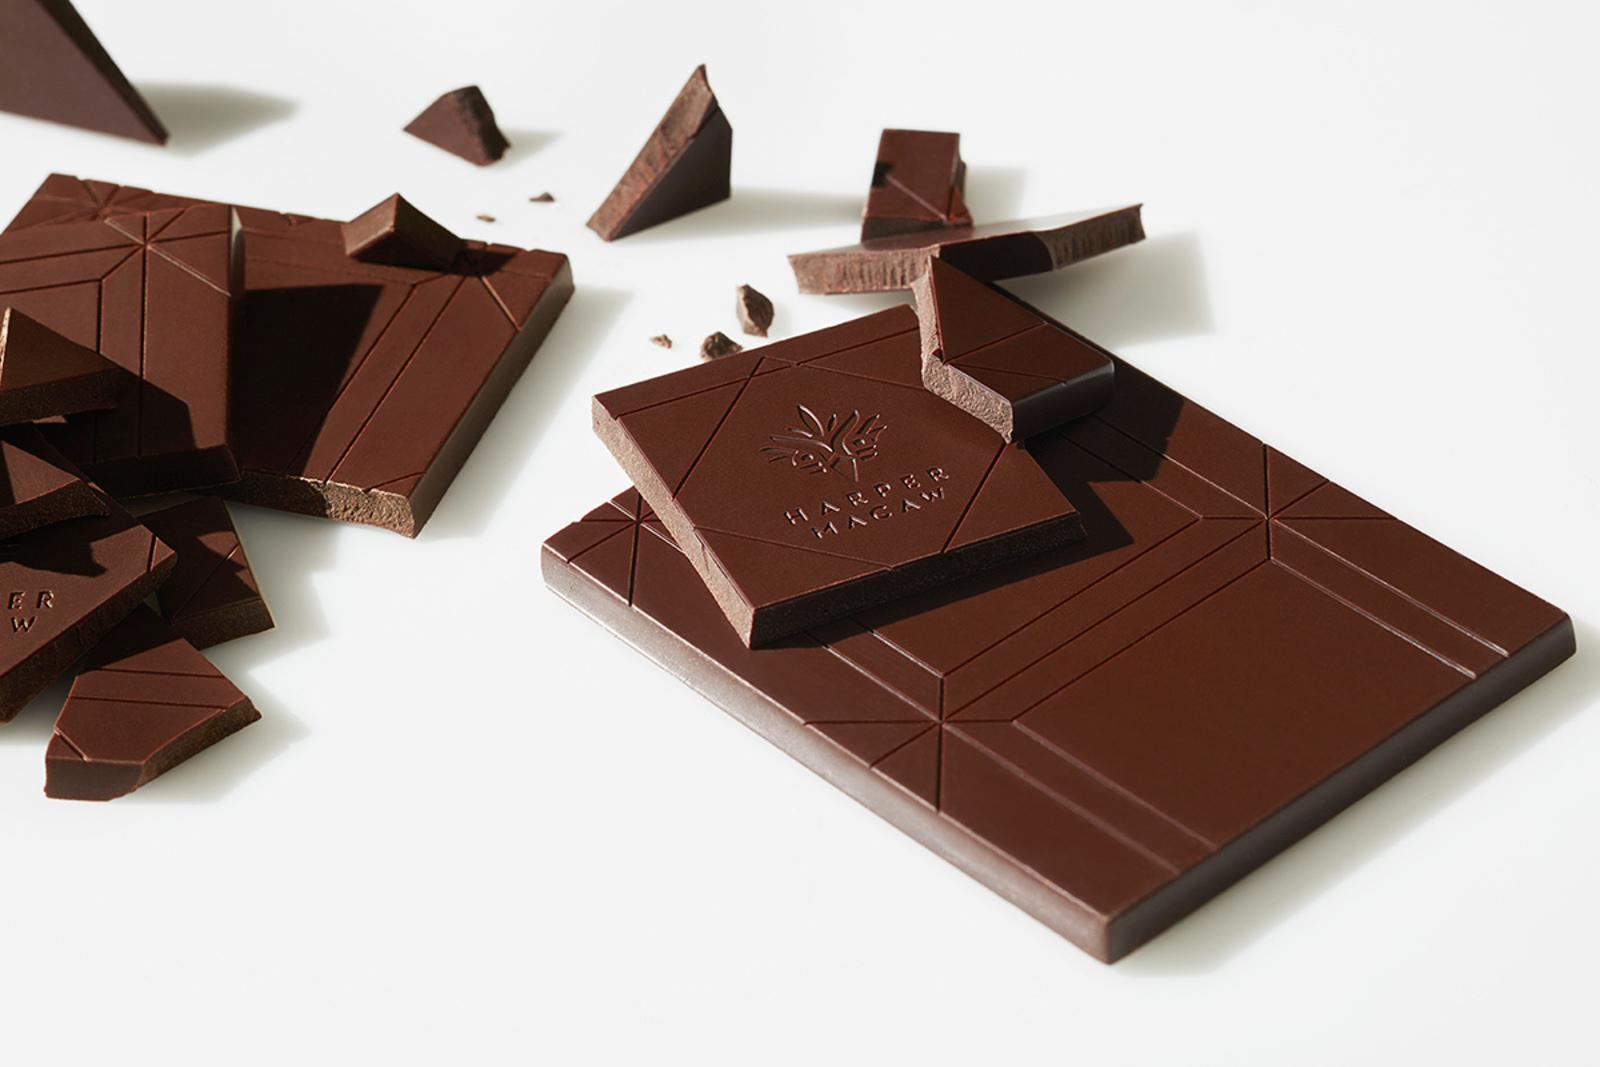 Harper Macaw chocolate bar